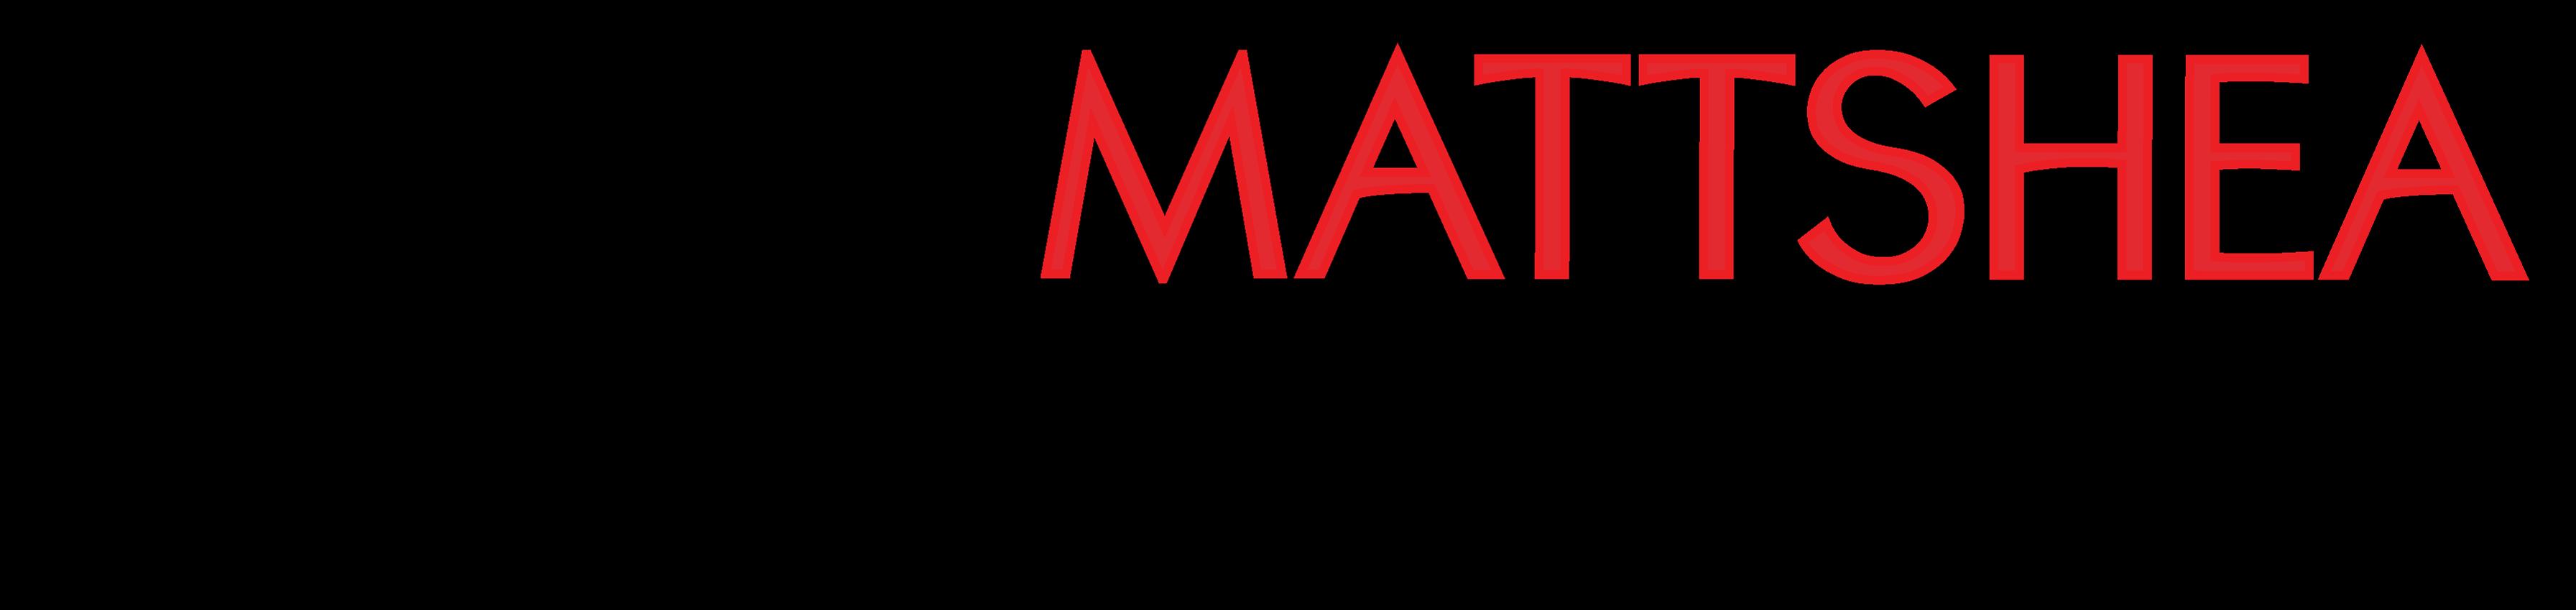 Matt Shea Books